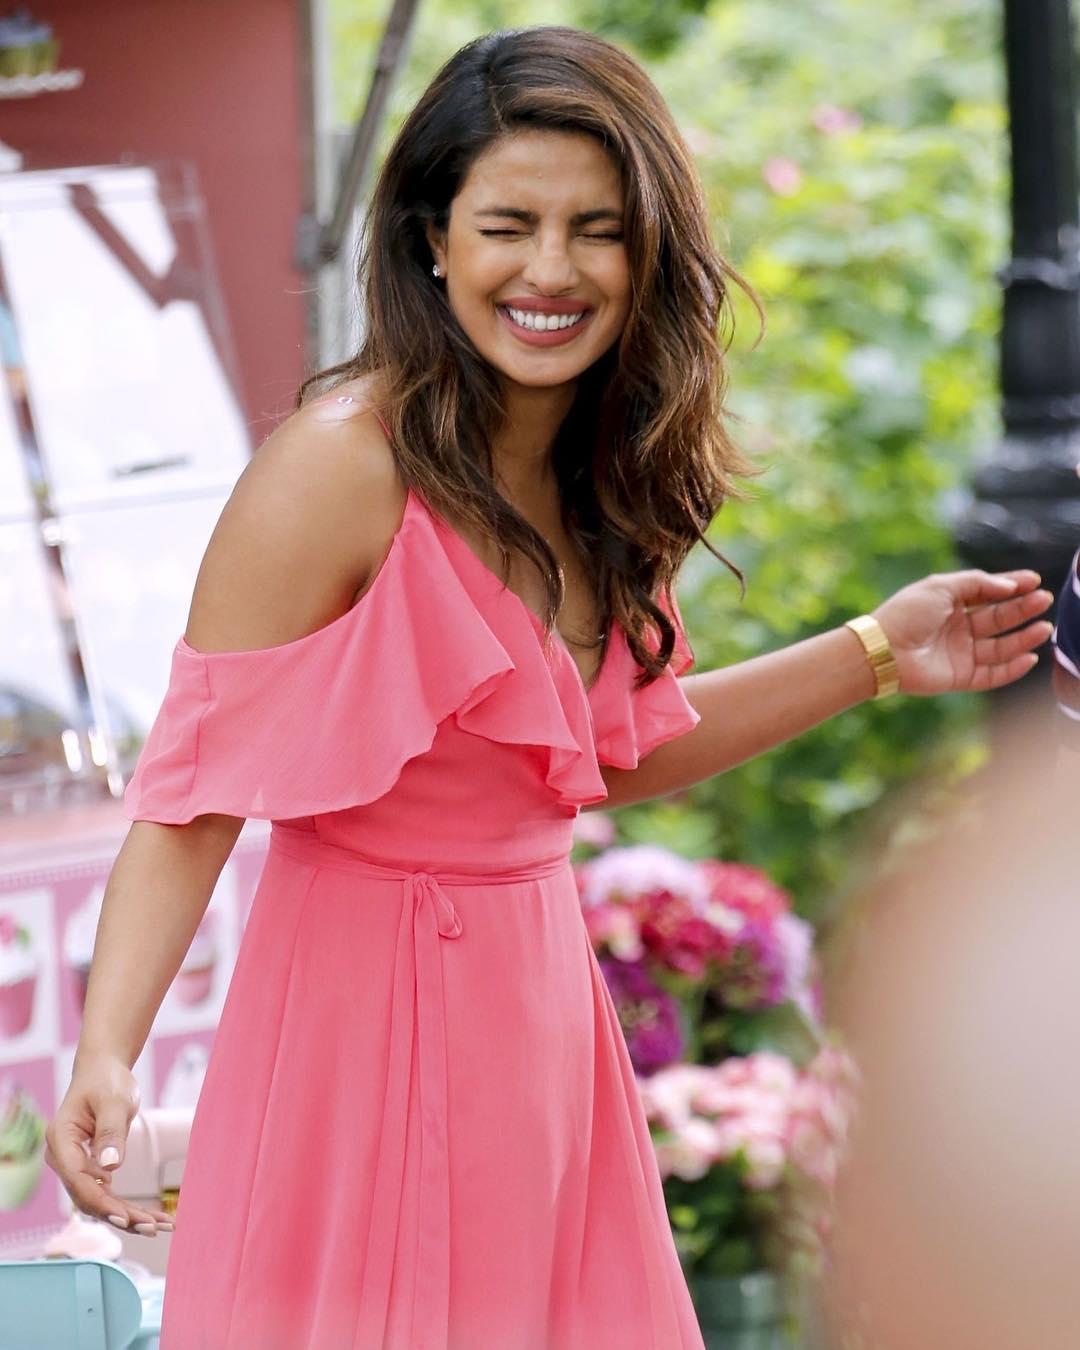 Priyanka Chopra Pink Dress Ultra Hd Latest Photos Leaked 2017  Pc At 3Rd Third -4802